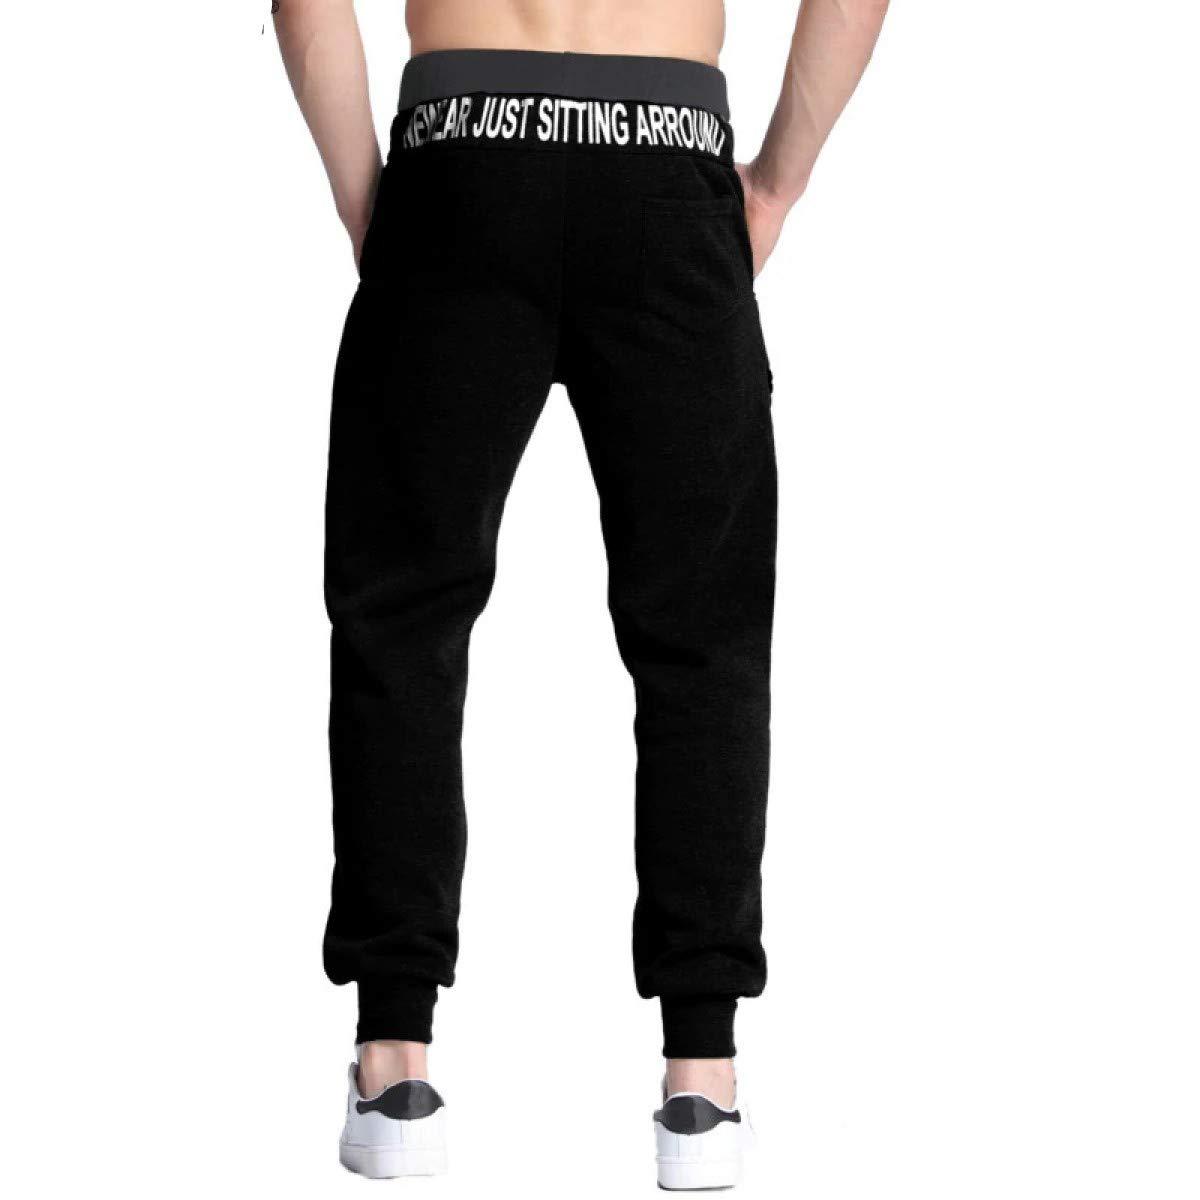 WEEKEND SHOP Men Sweatpants Fleece Hip-hop Joggers Trousers ...